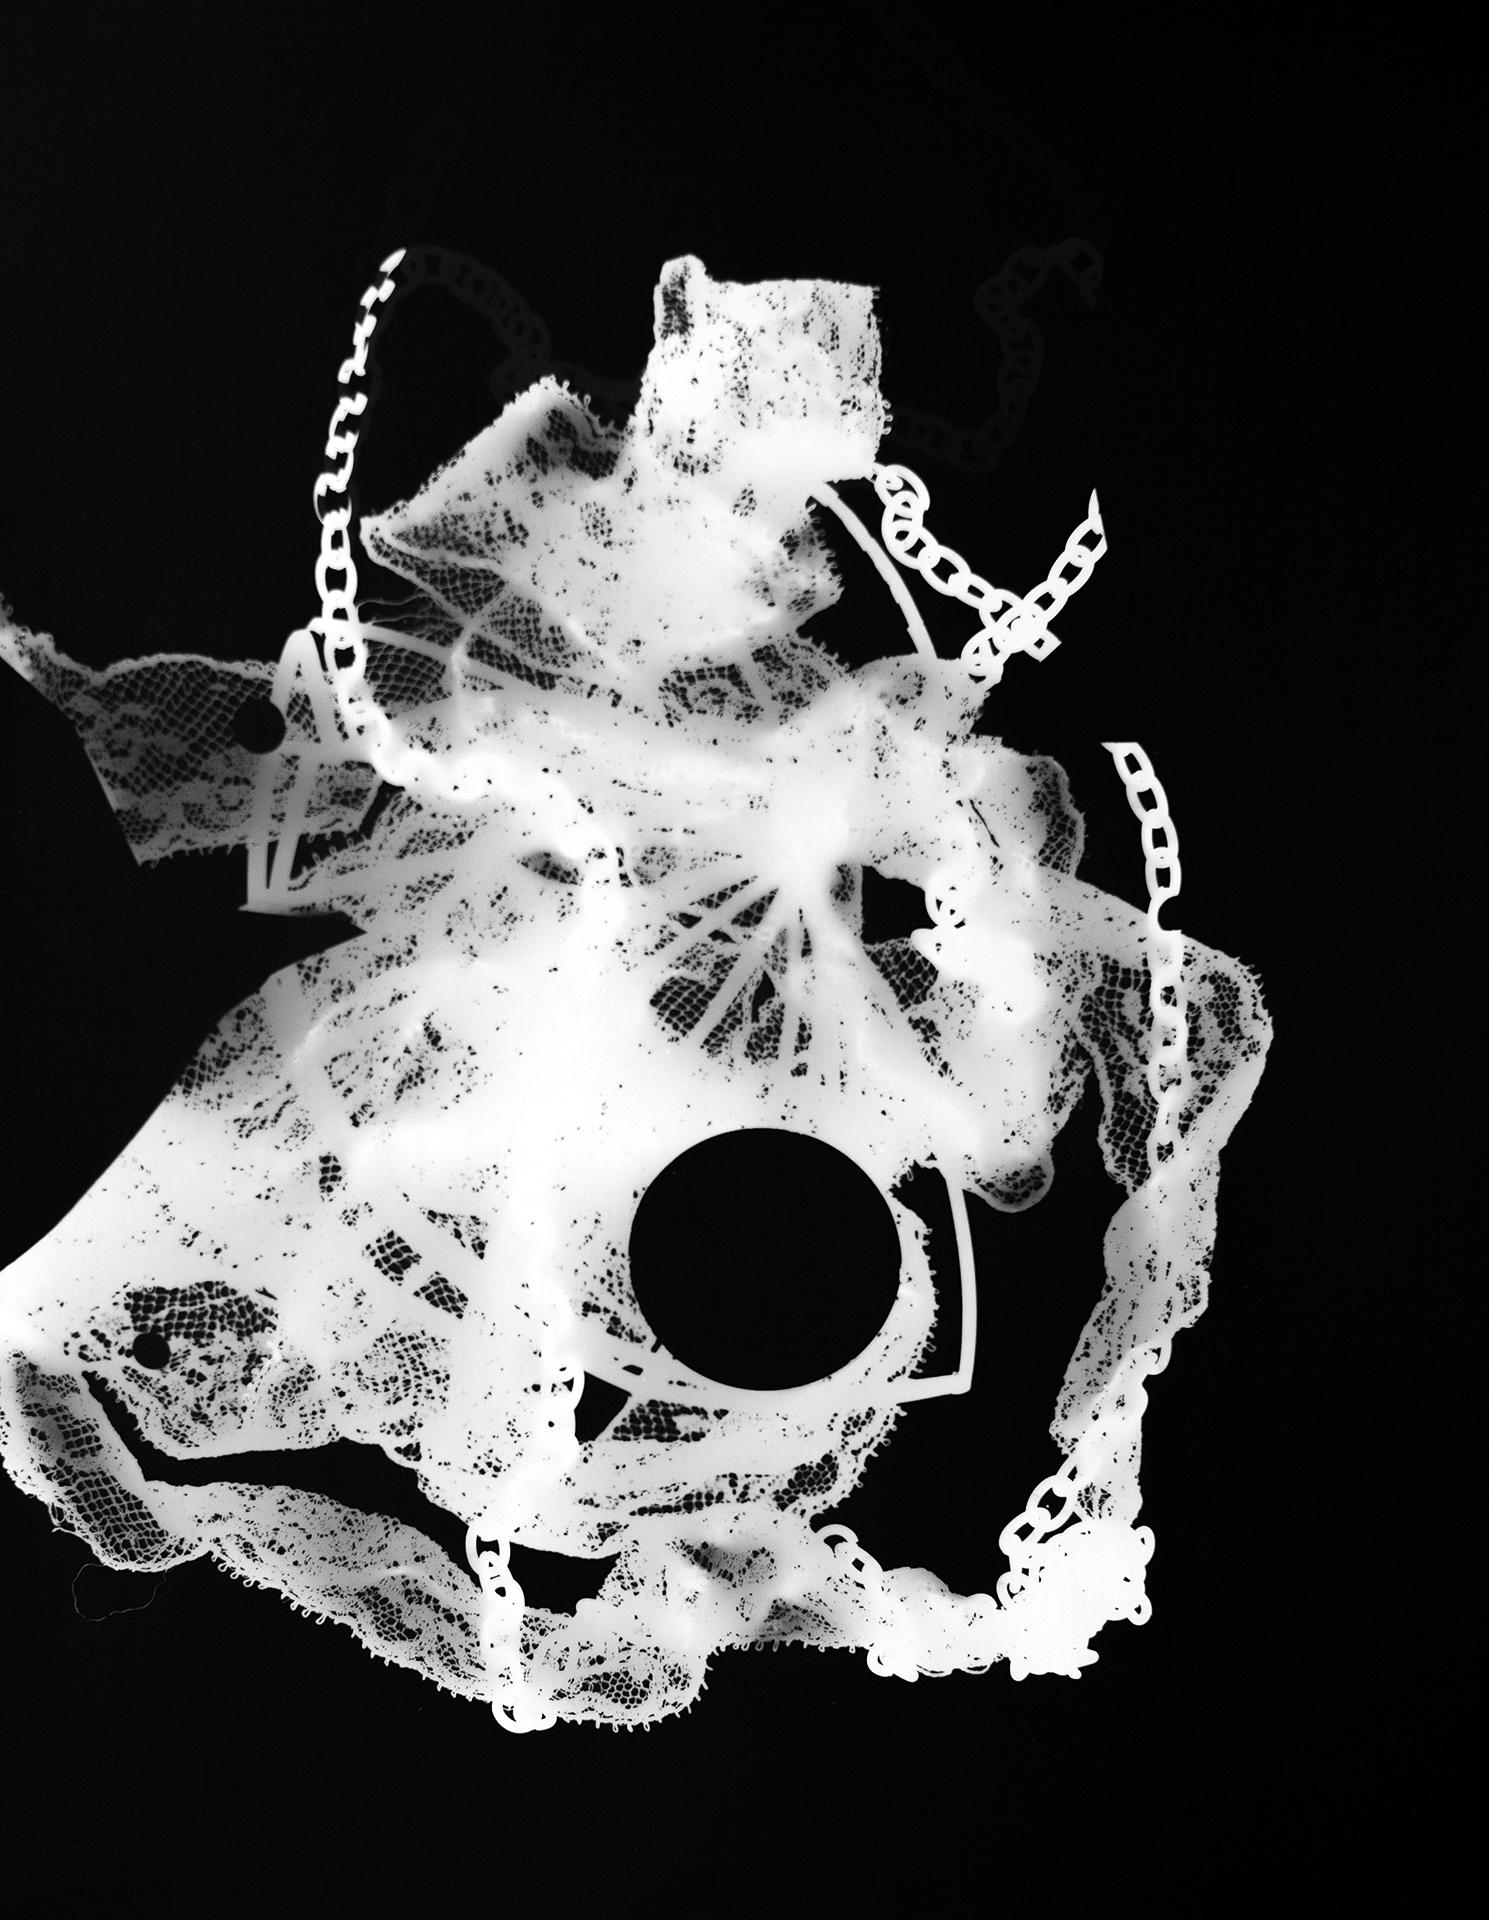 Lace/chain, 2015